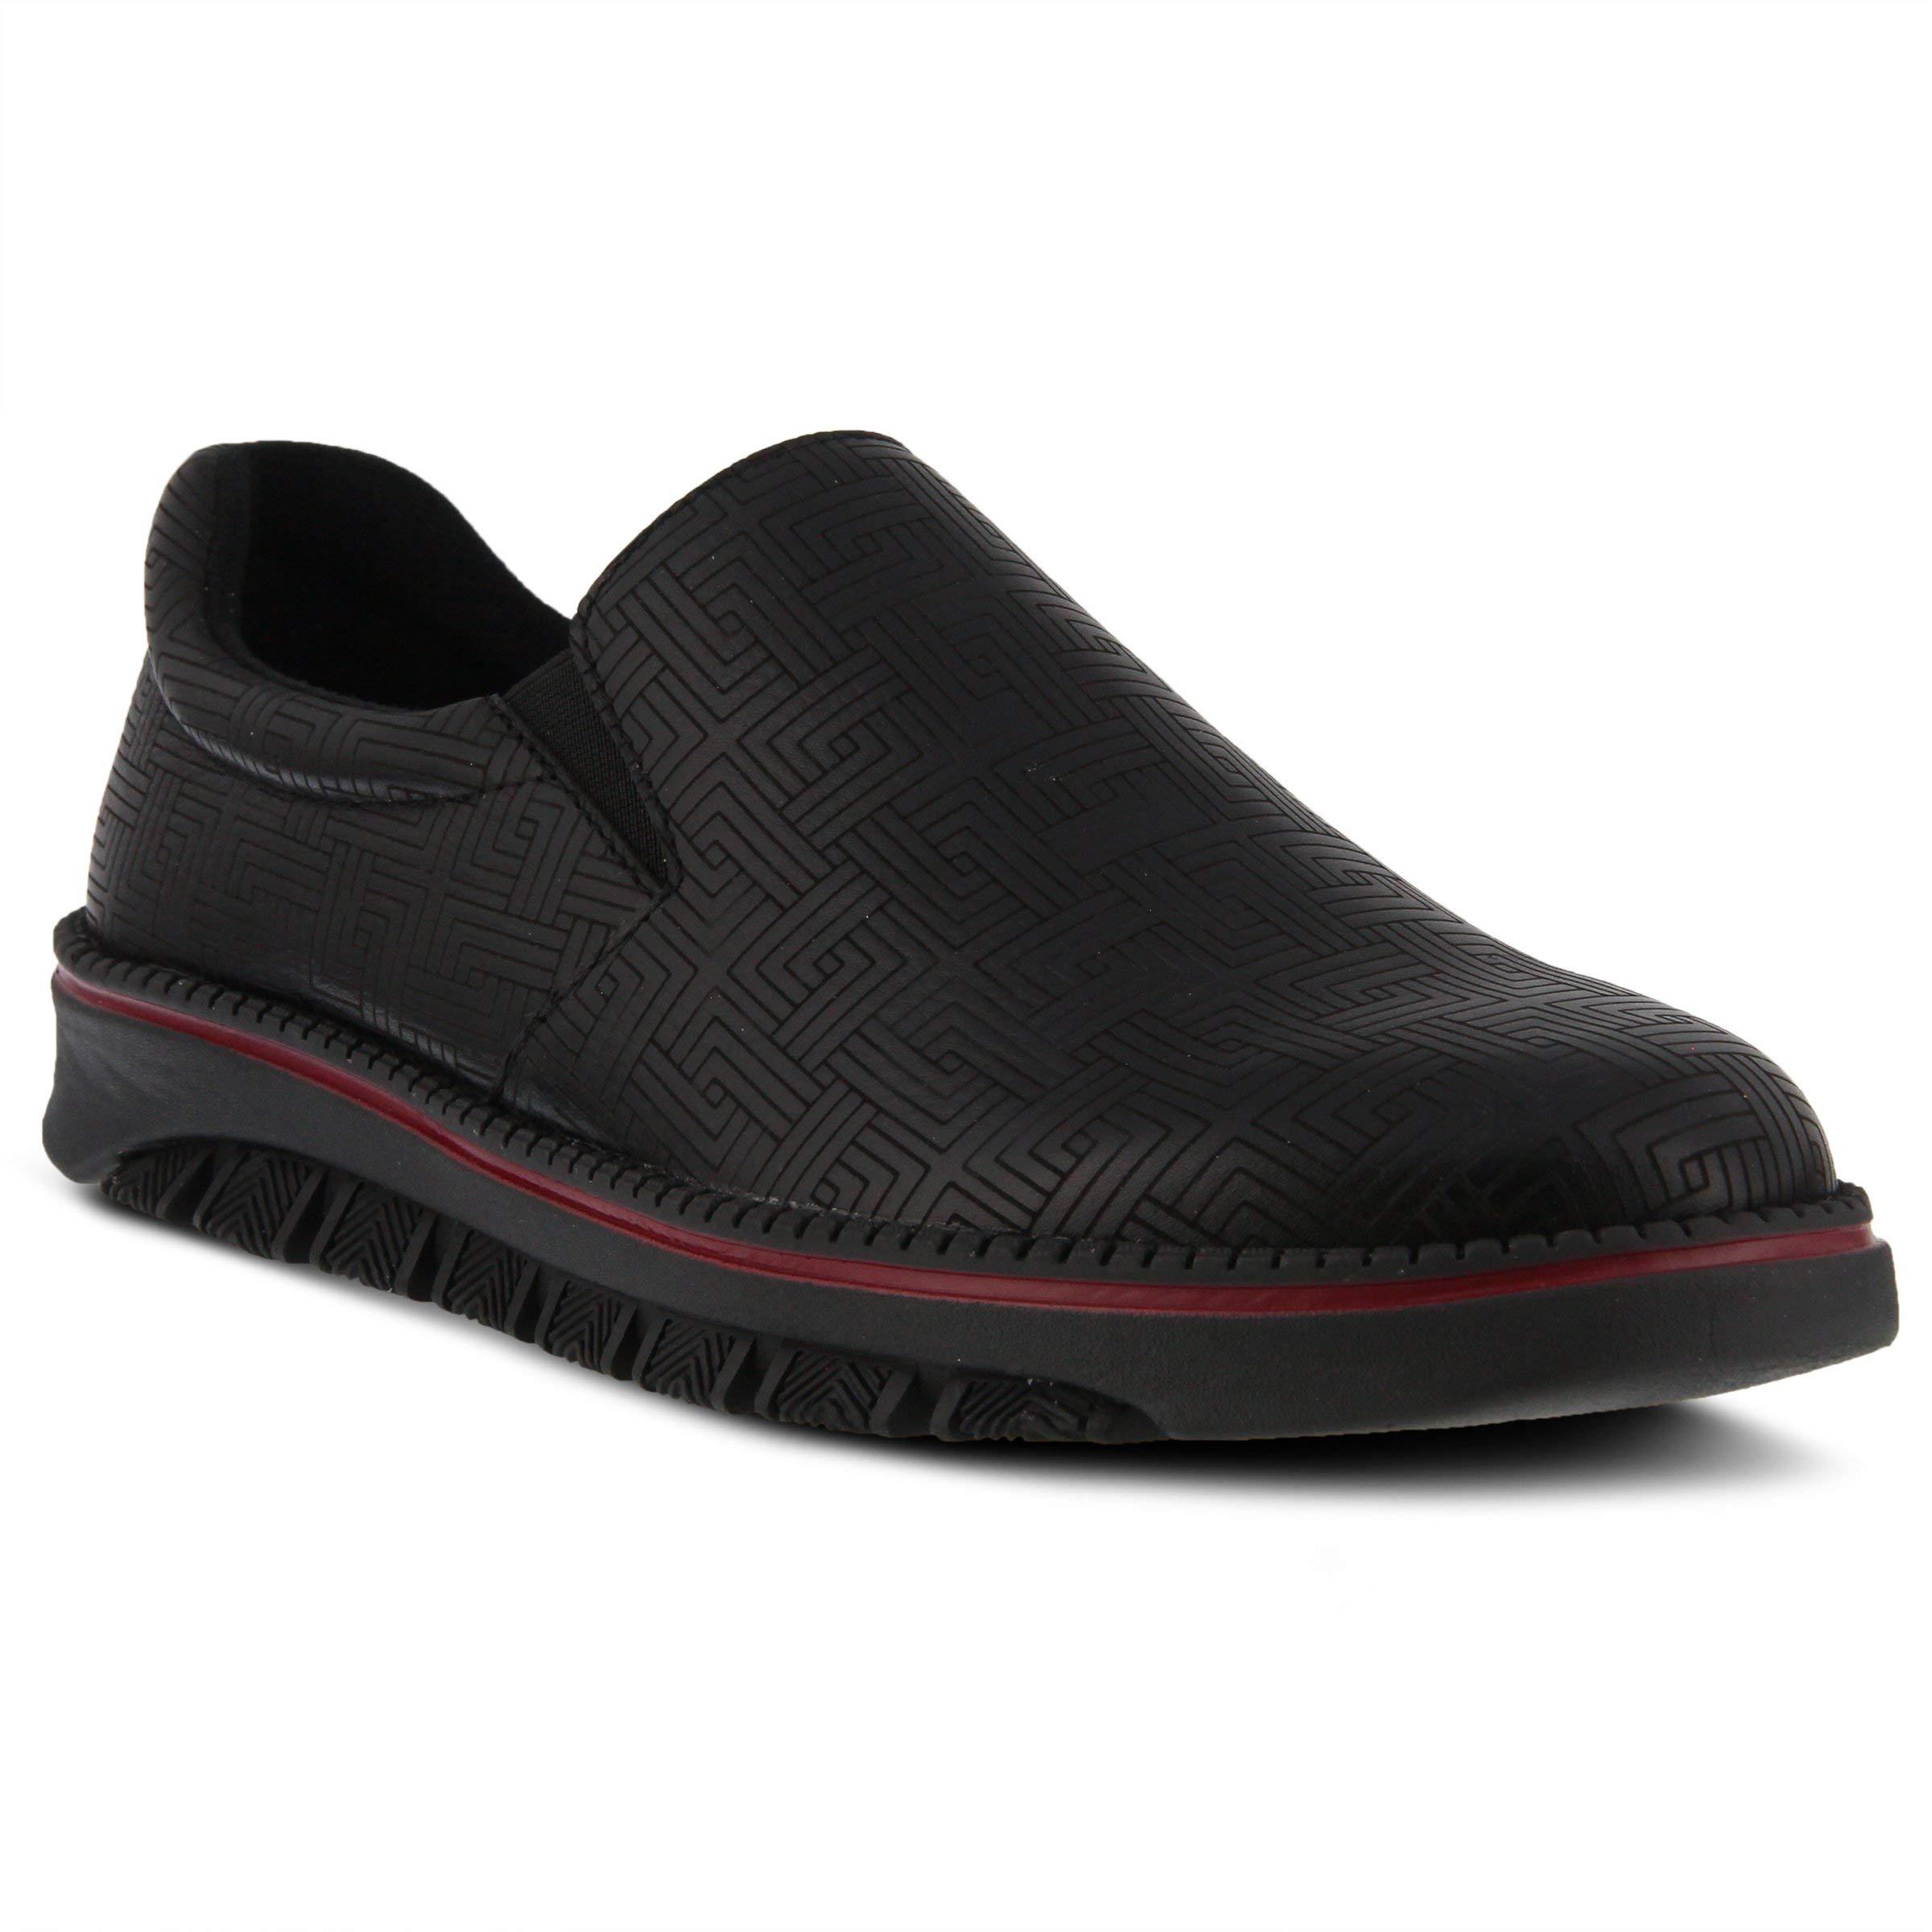 Spring Step Professional Women's Power-Maze Uniform Dress Shoe, Black, 7.5 Medium US by Spring Step Professional